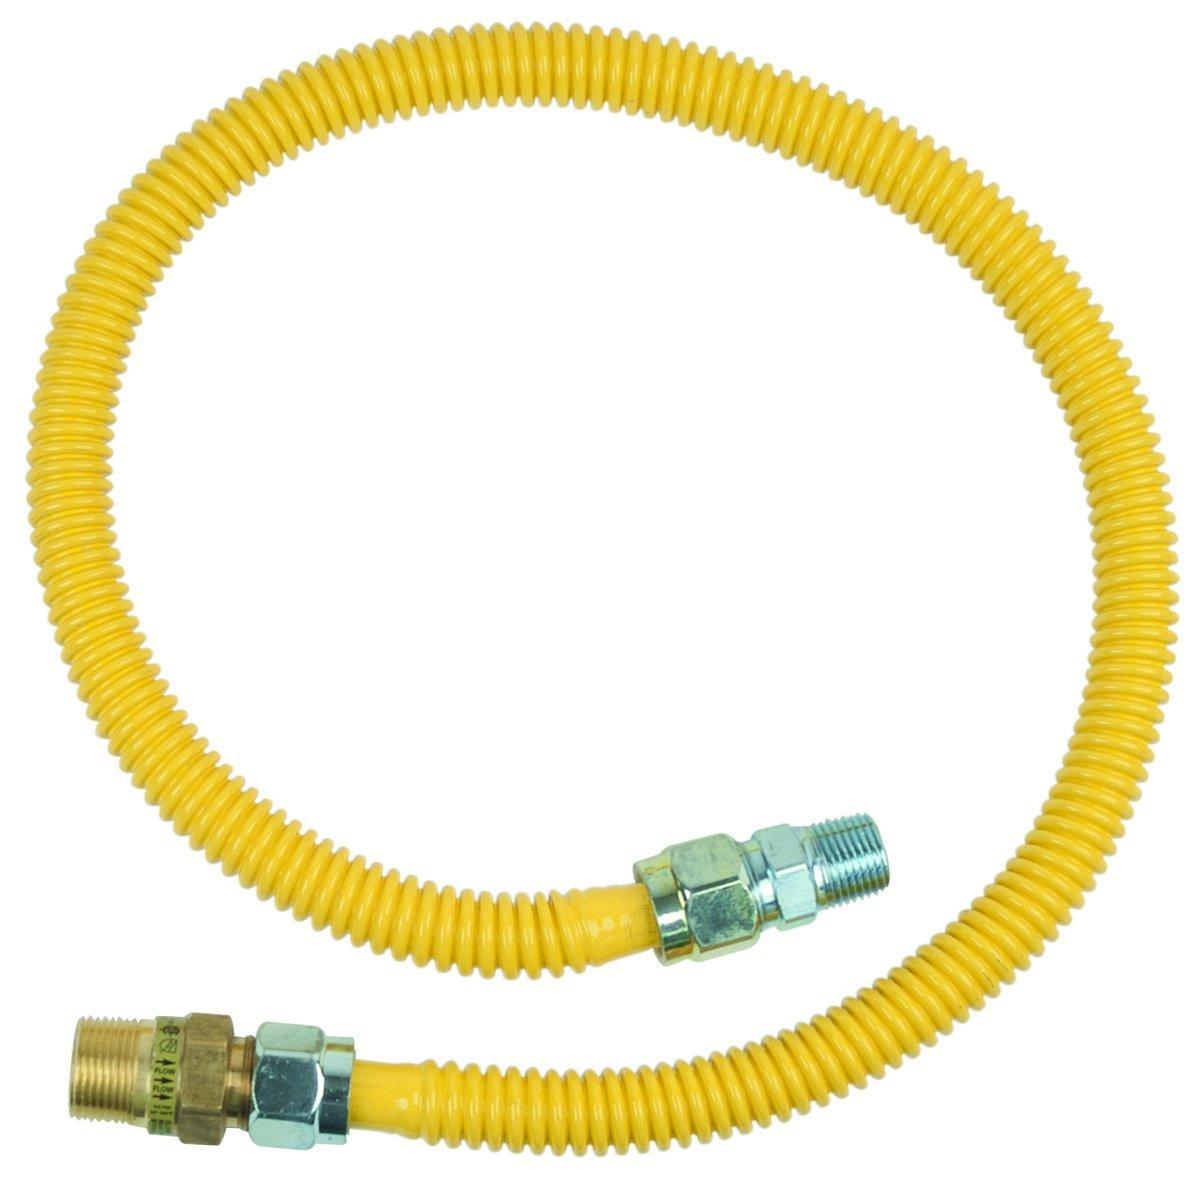 BrassCraft CSSC14E-36 P 3/4-Inch MIP EFV x 1/2-Inch MIP x 36-Inch Safety PLUS Gas Appliance Connector with 5/8-Inch OD